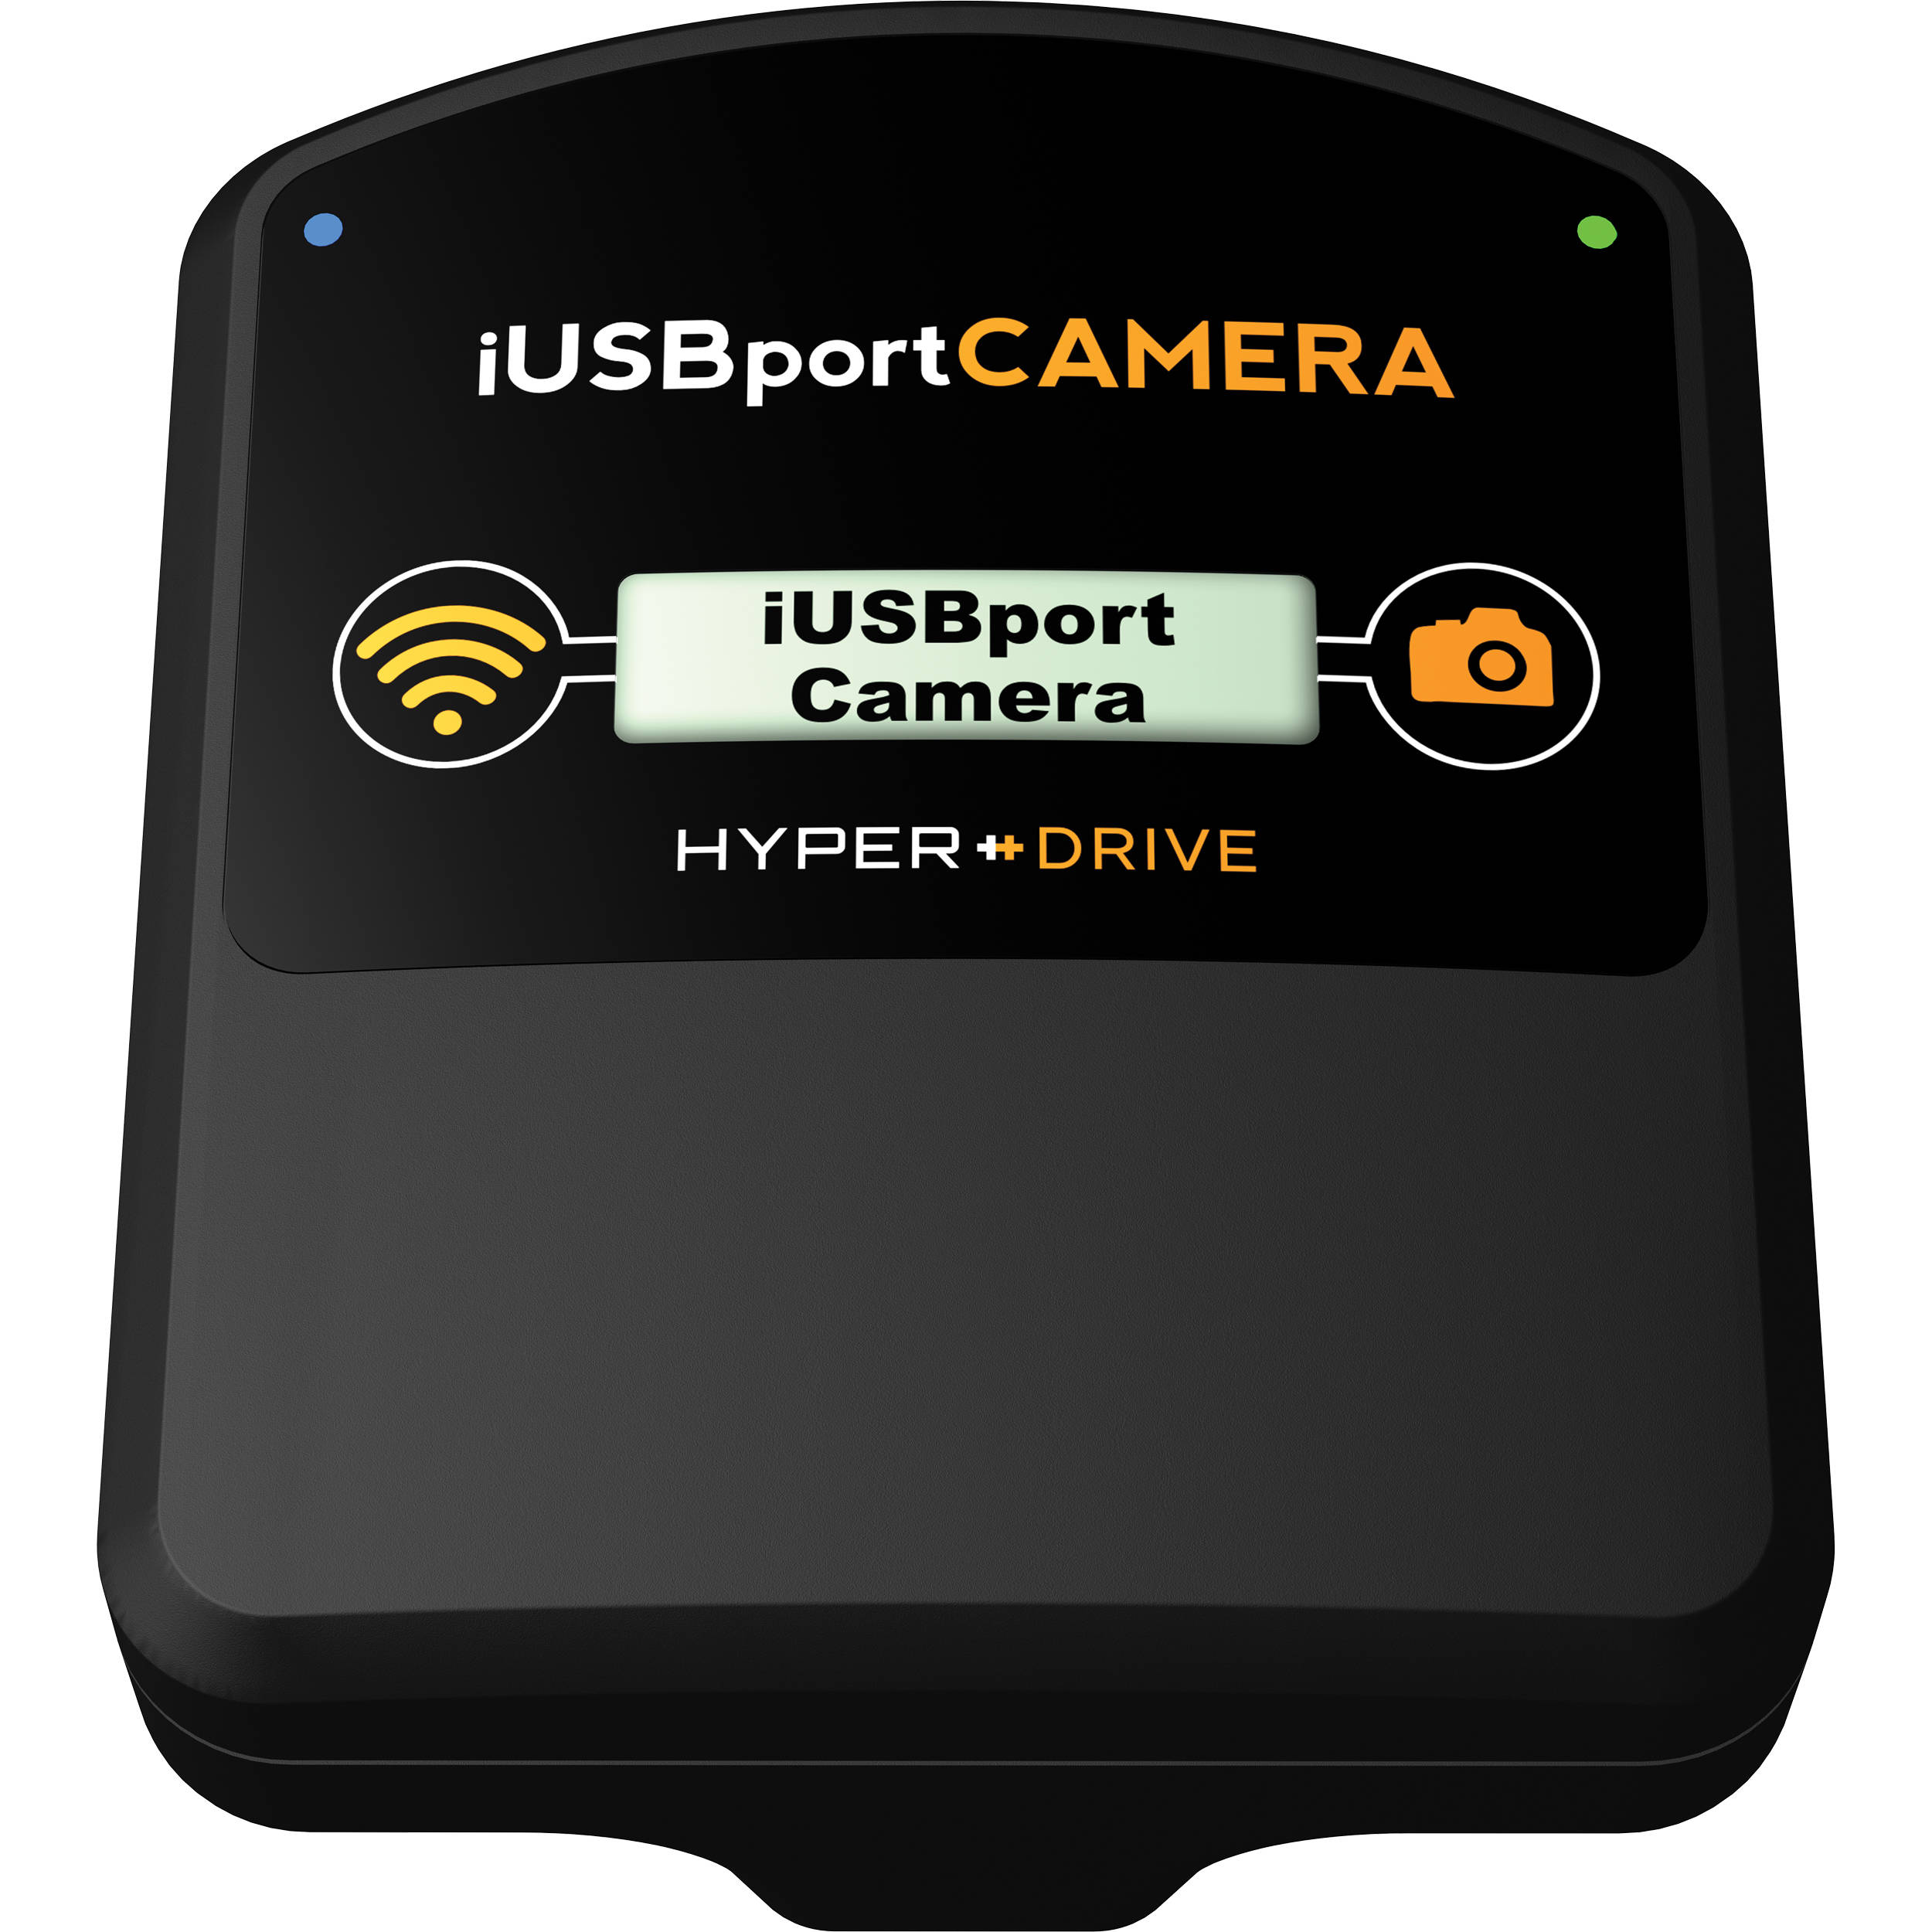 Camera Wireless Dslr Camera Control sanho hyperdrive iusbportcamera wireless transmitter sahdcm bh transmitter